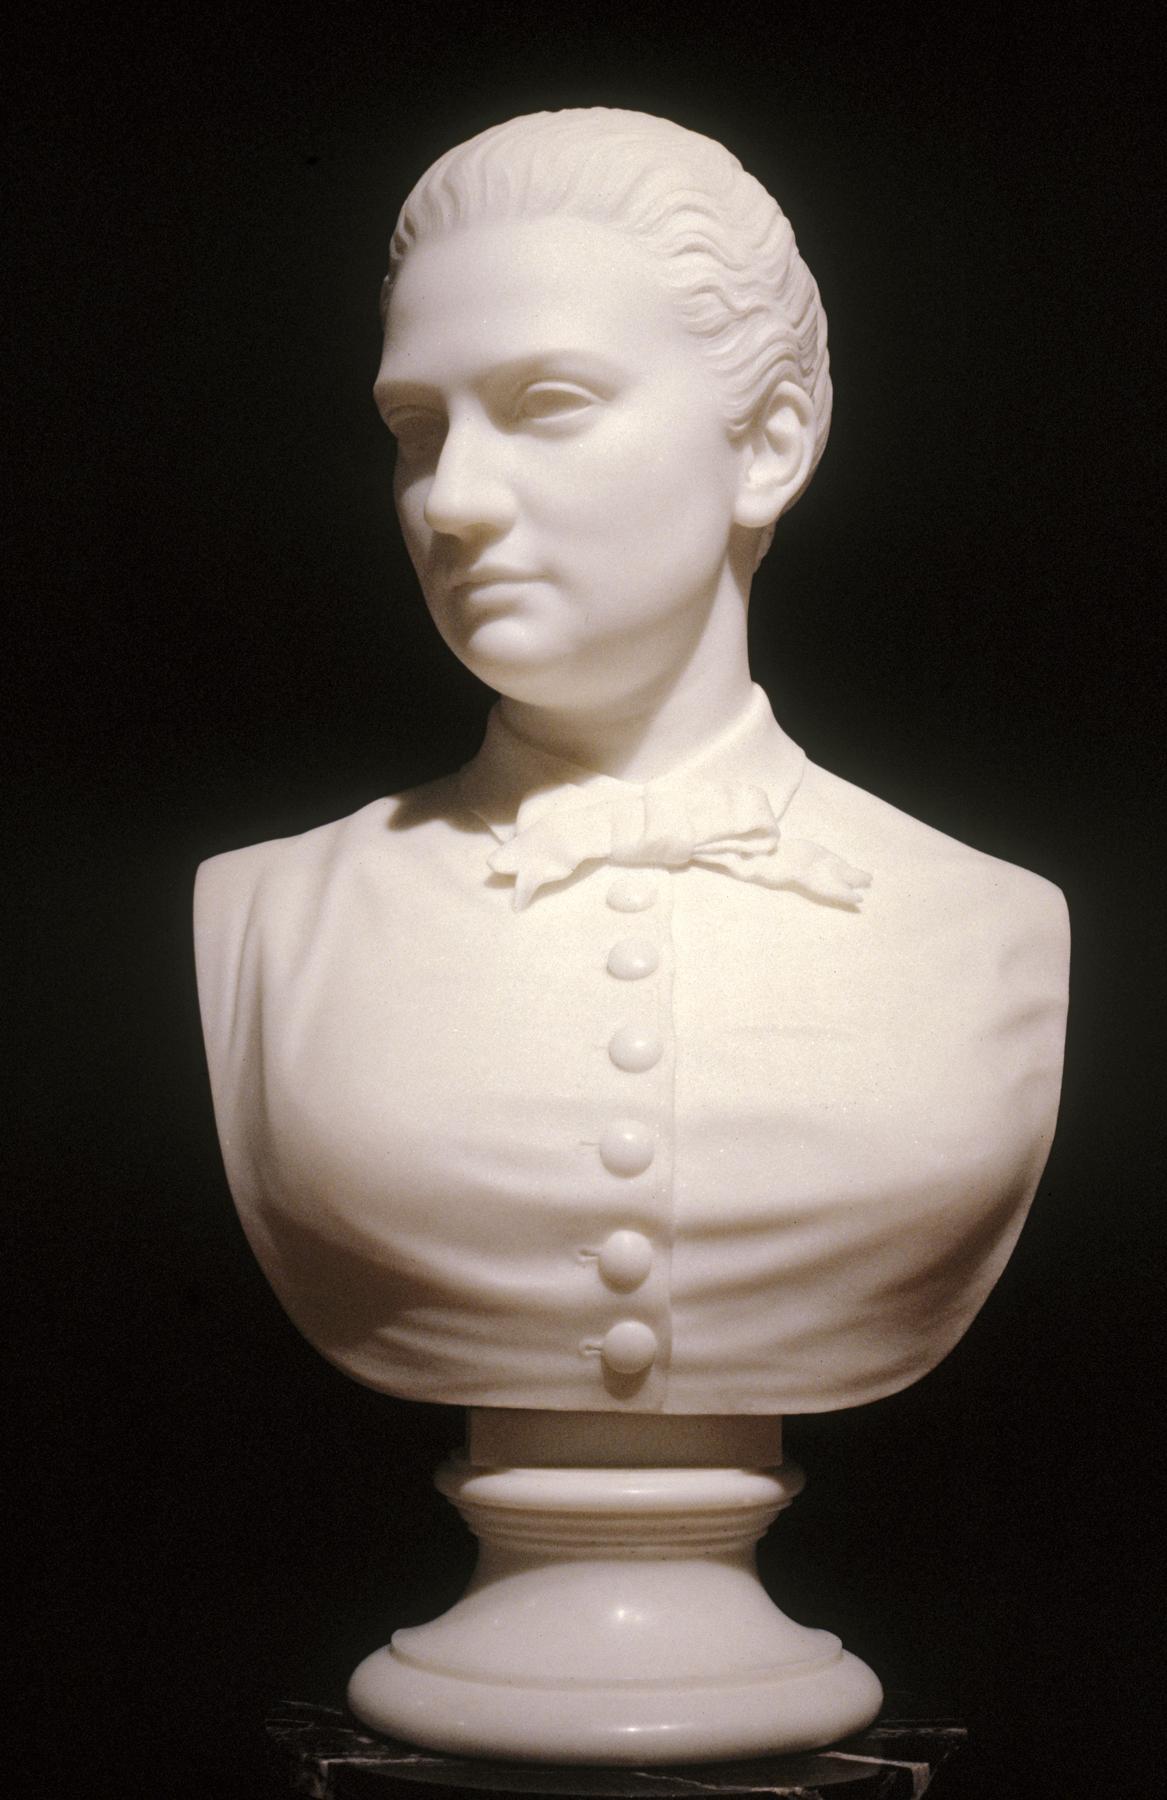 https://upload.wikimedia.org/wikipedia/commons/c/c3/William_Henry_Rinehart_-_Bust_of_Jennie_Walters_-_Walters_2820.jpg